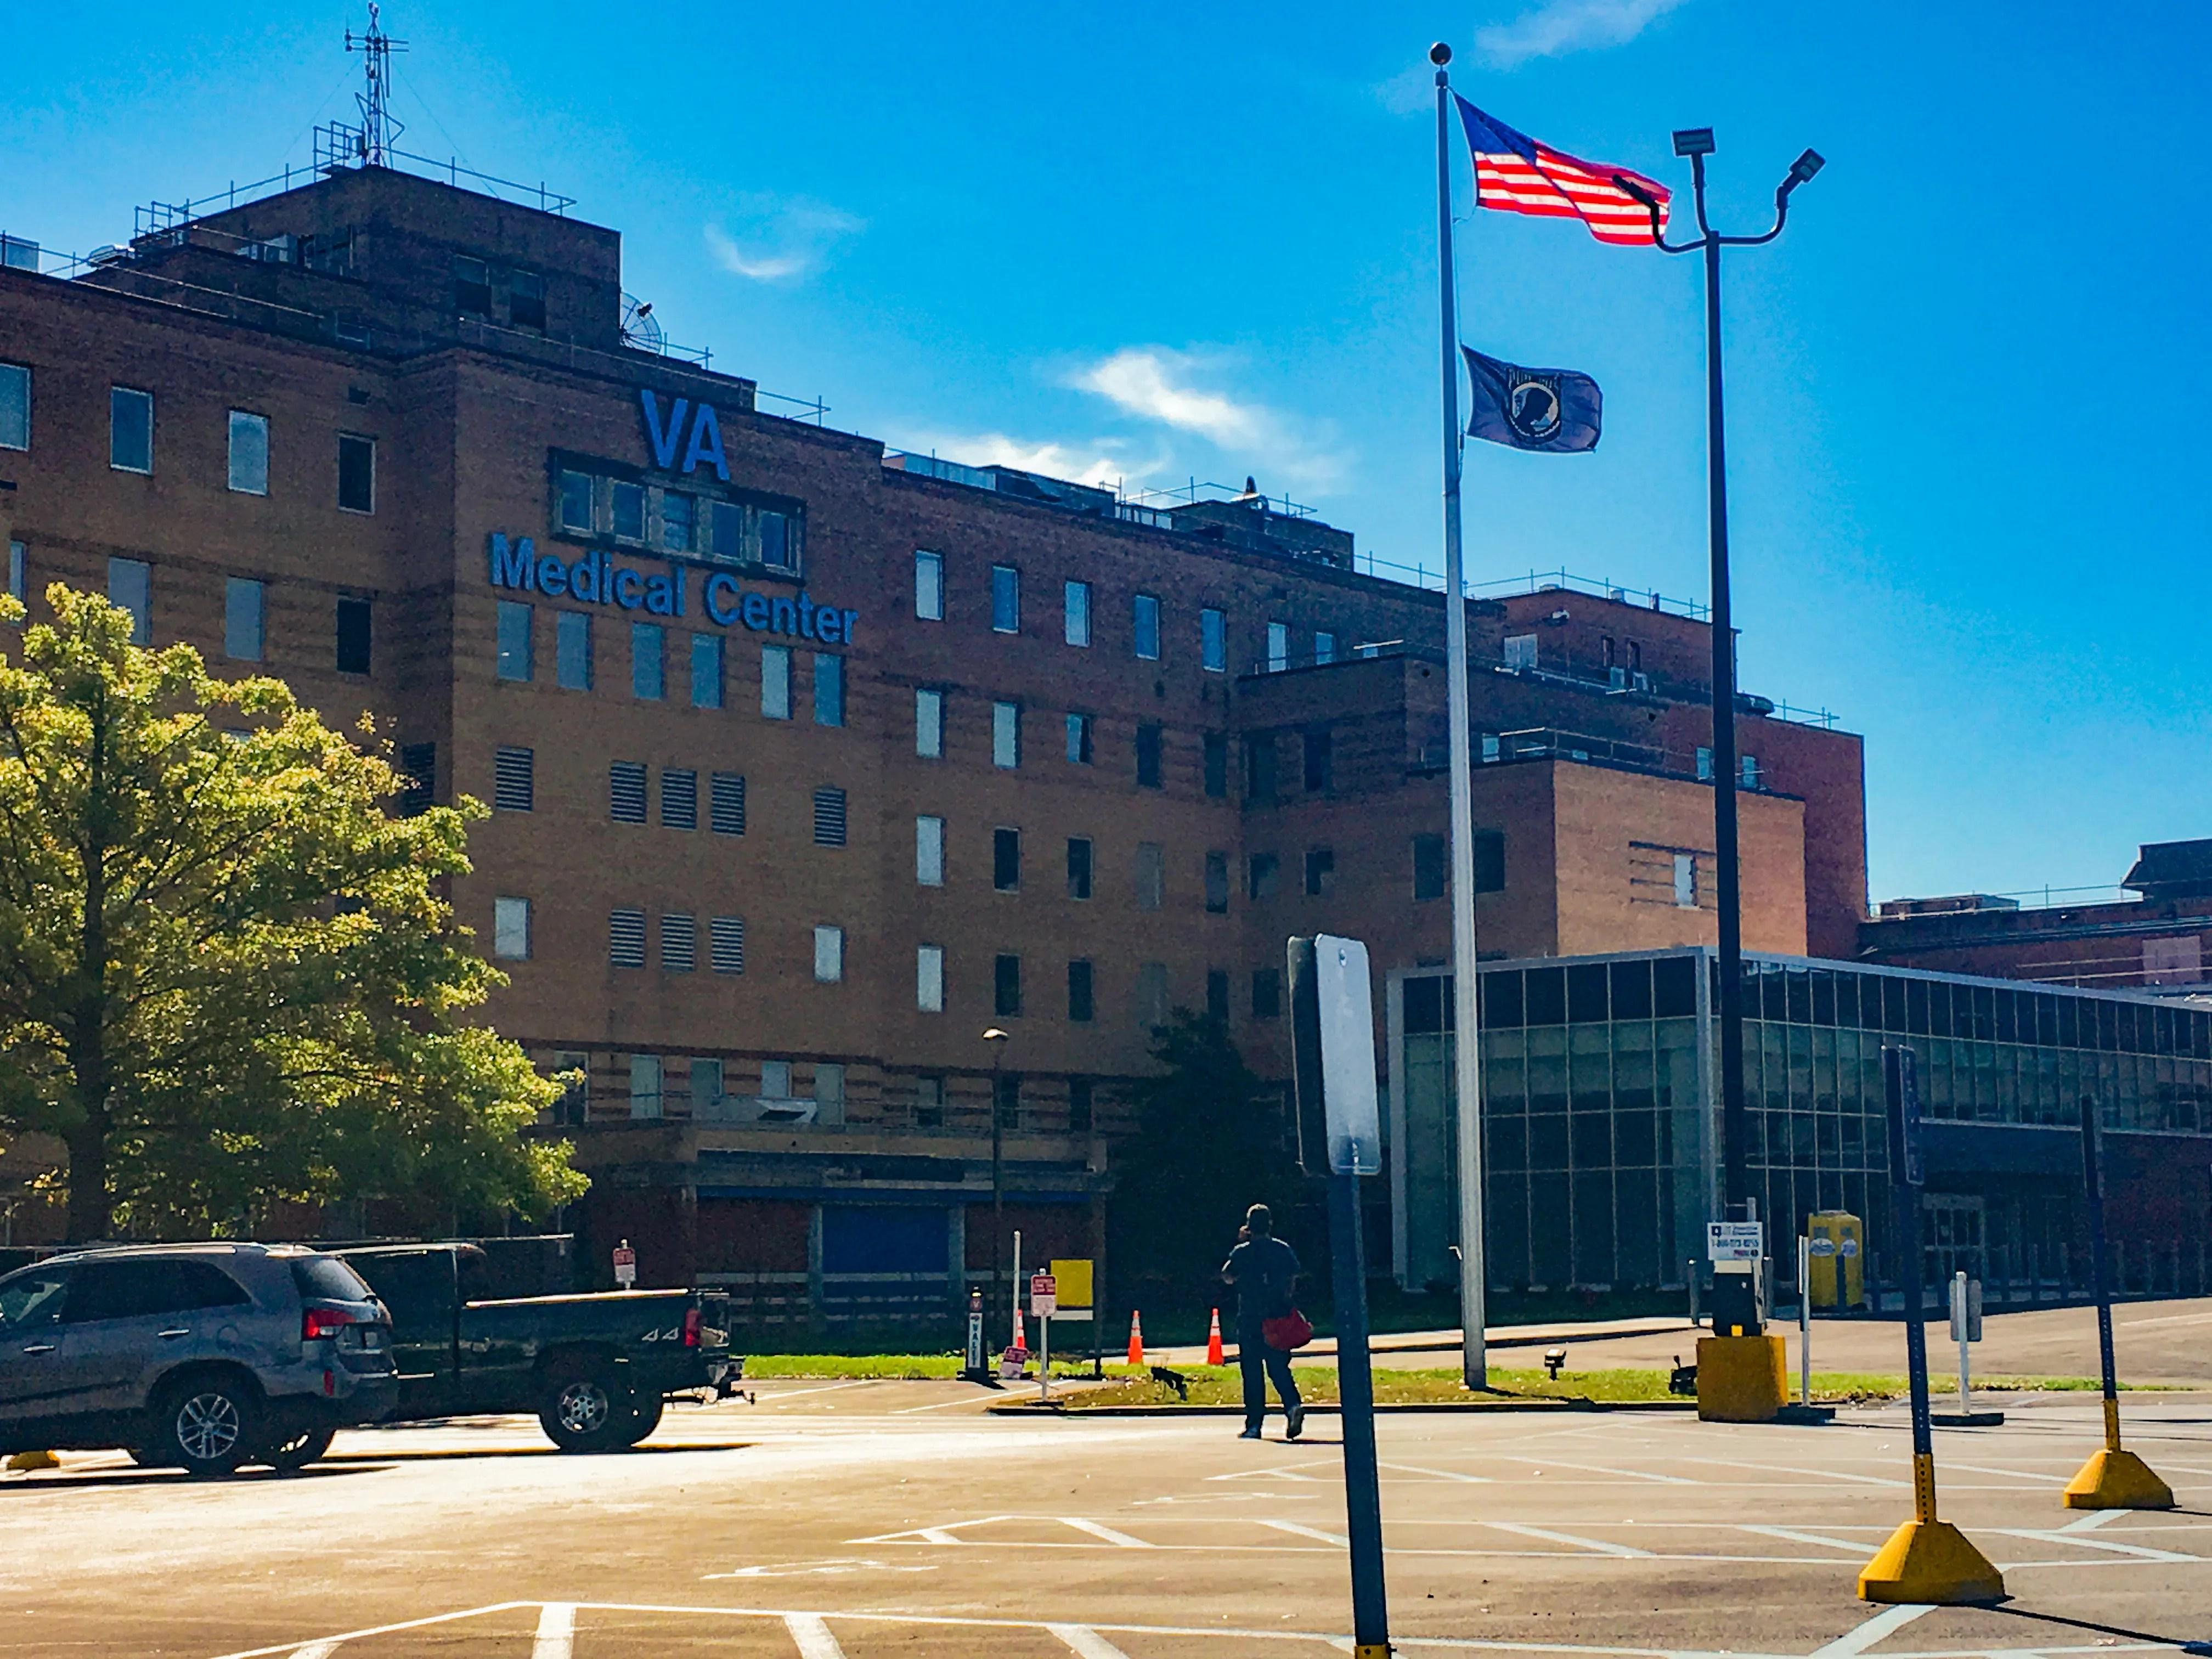 The Louis A. Johnson VA Medical Center in Clarksburg, West Virginia, serves 70,000 veterans.